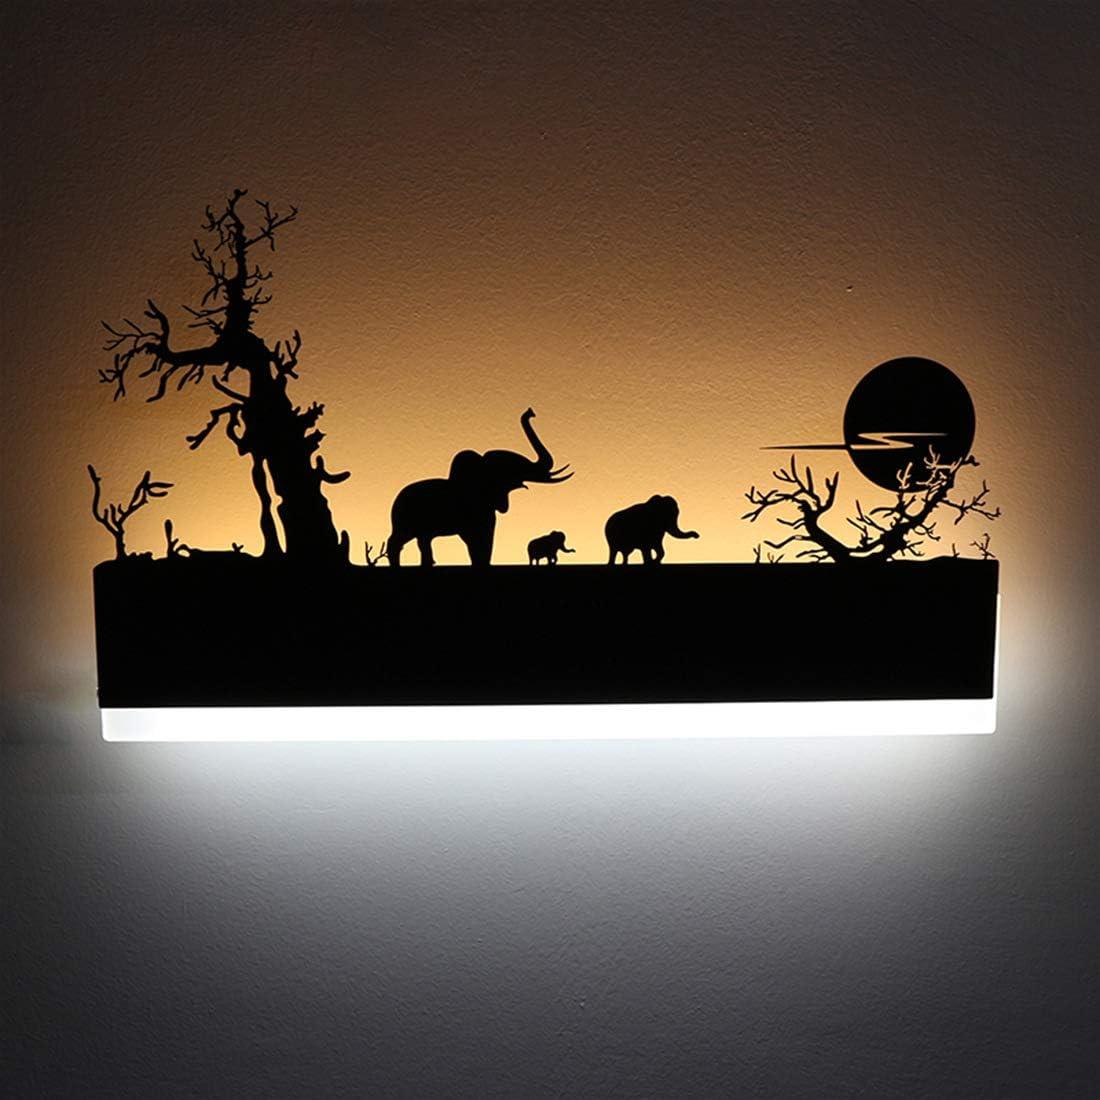 ZMISHIBO Retro Wall Lights Bathroom Coconut Tree Hollow Black Iron Sconce for Living Room